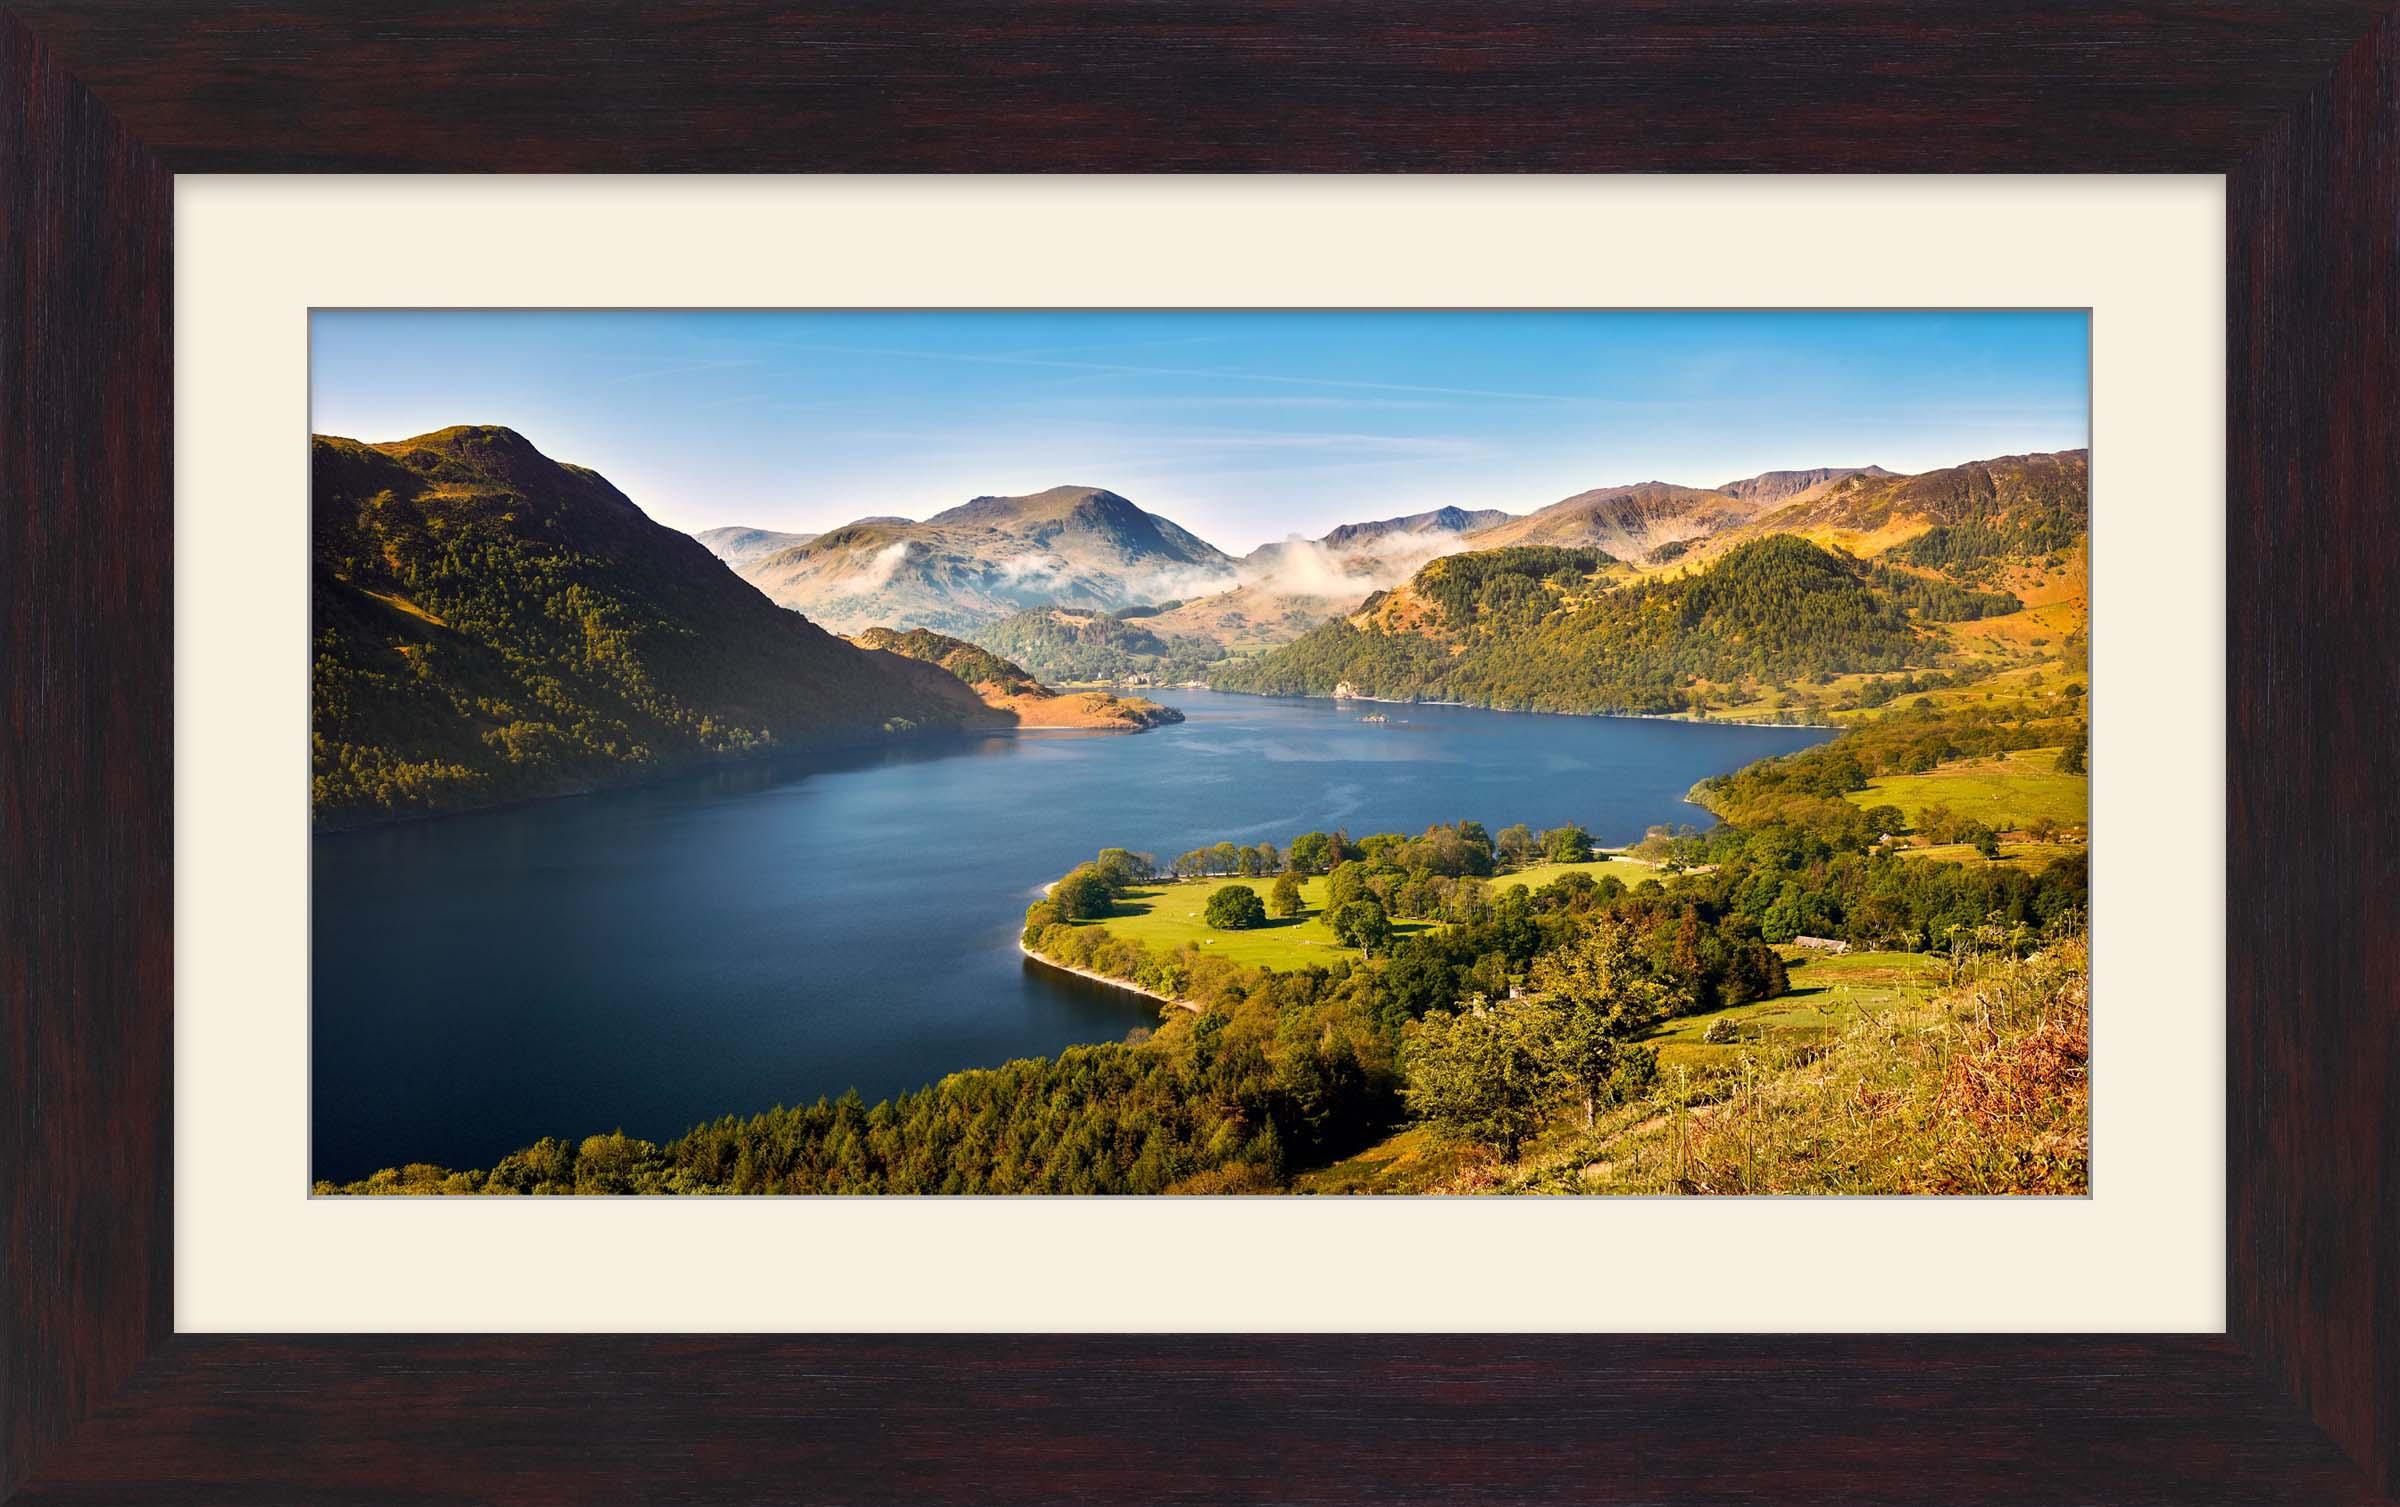 Spring at Ullswater - Lake District Framed Prints